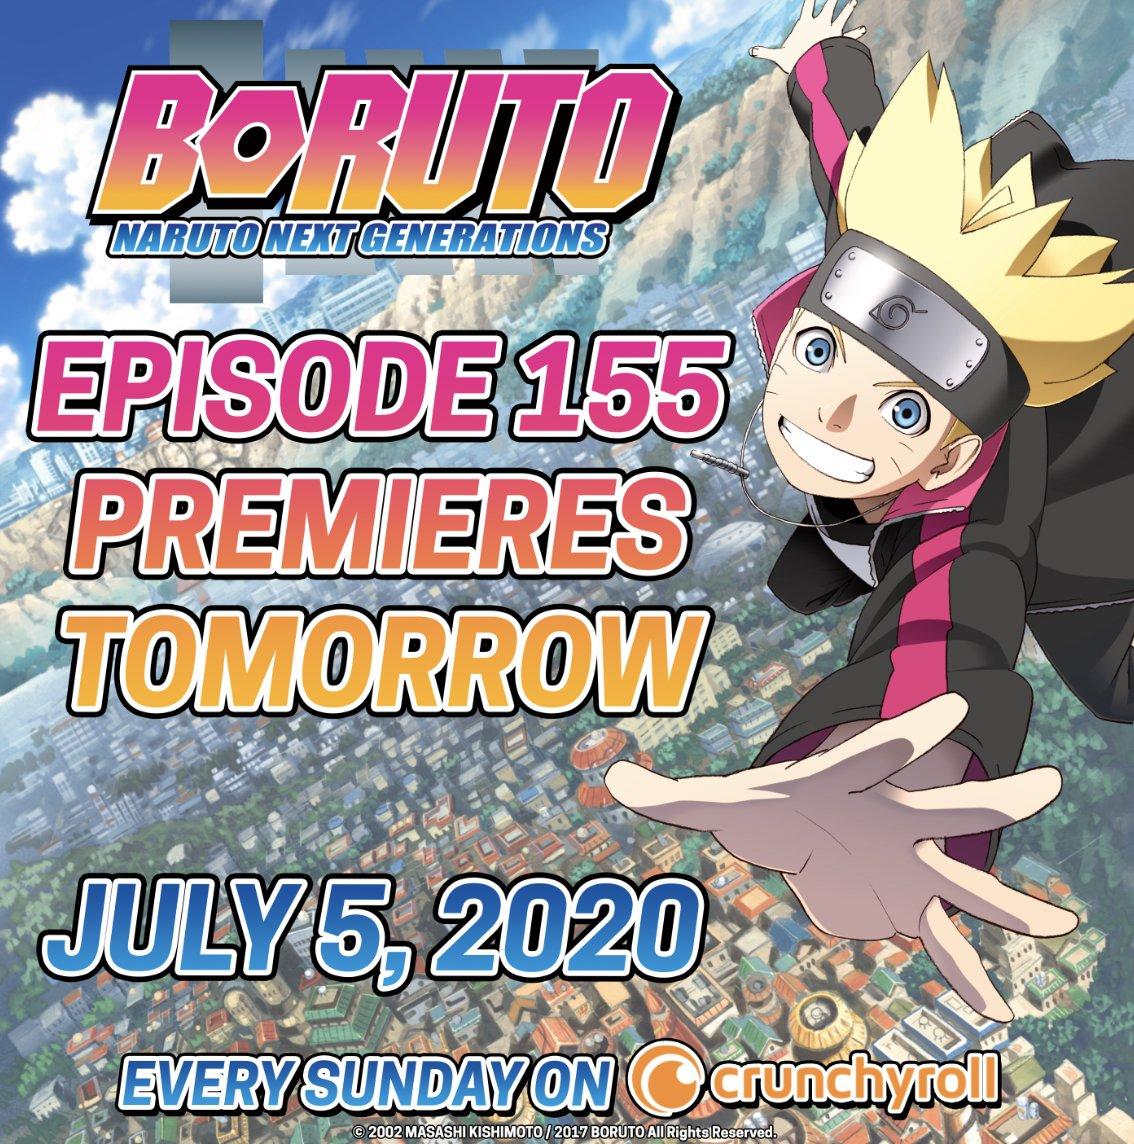 BORUTO RETURNS TOMORROW! pic.twitter.com/2gK5YkSQIF  by BORUTO: NARUTO NEXT GENERATIONS